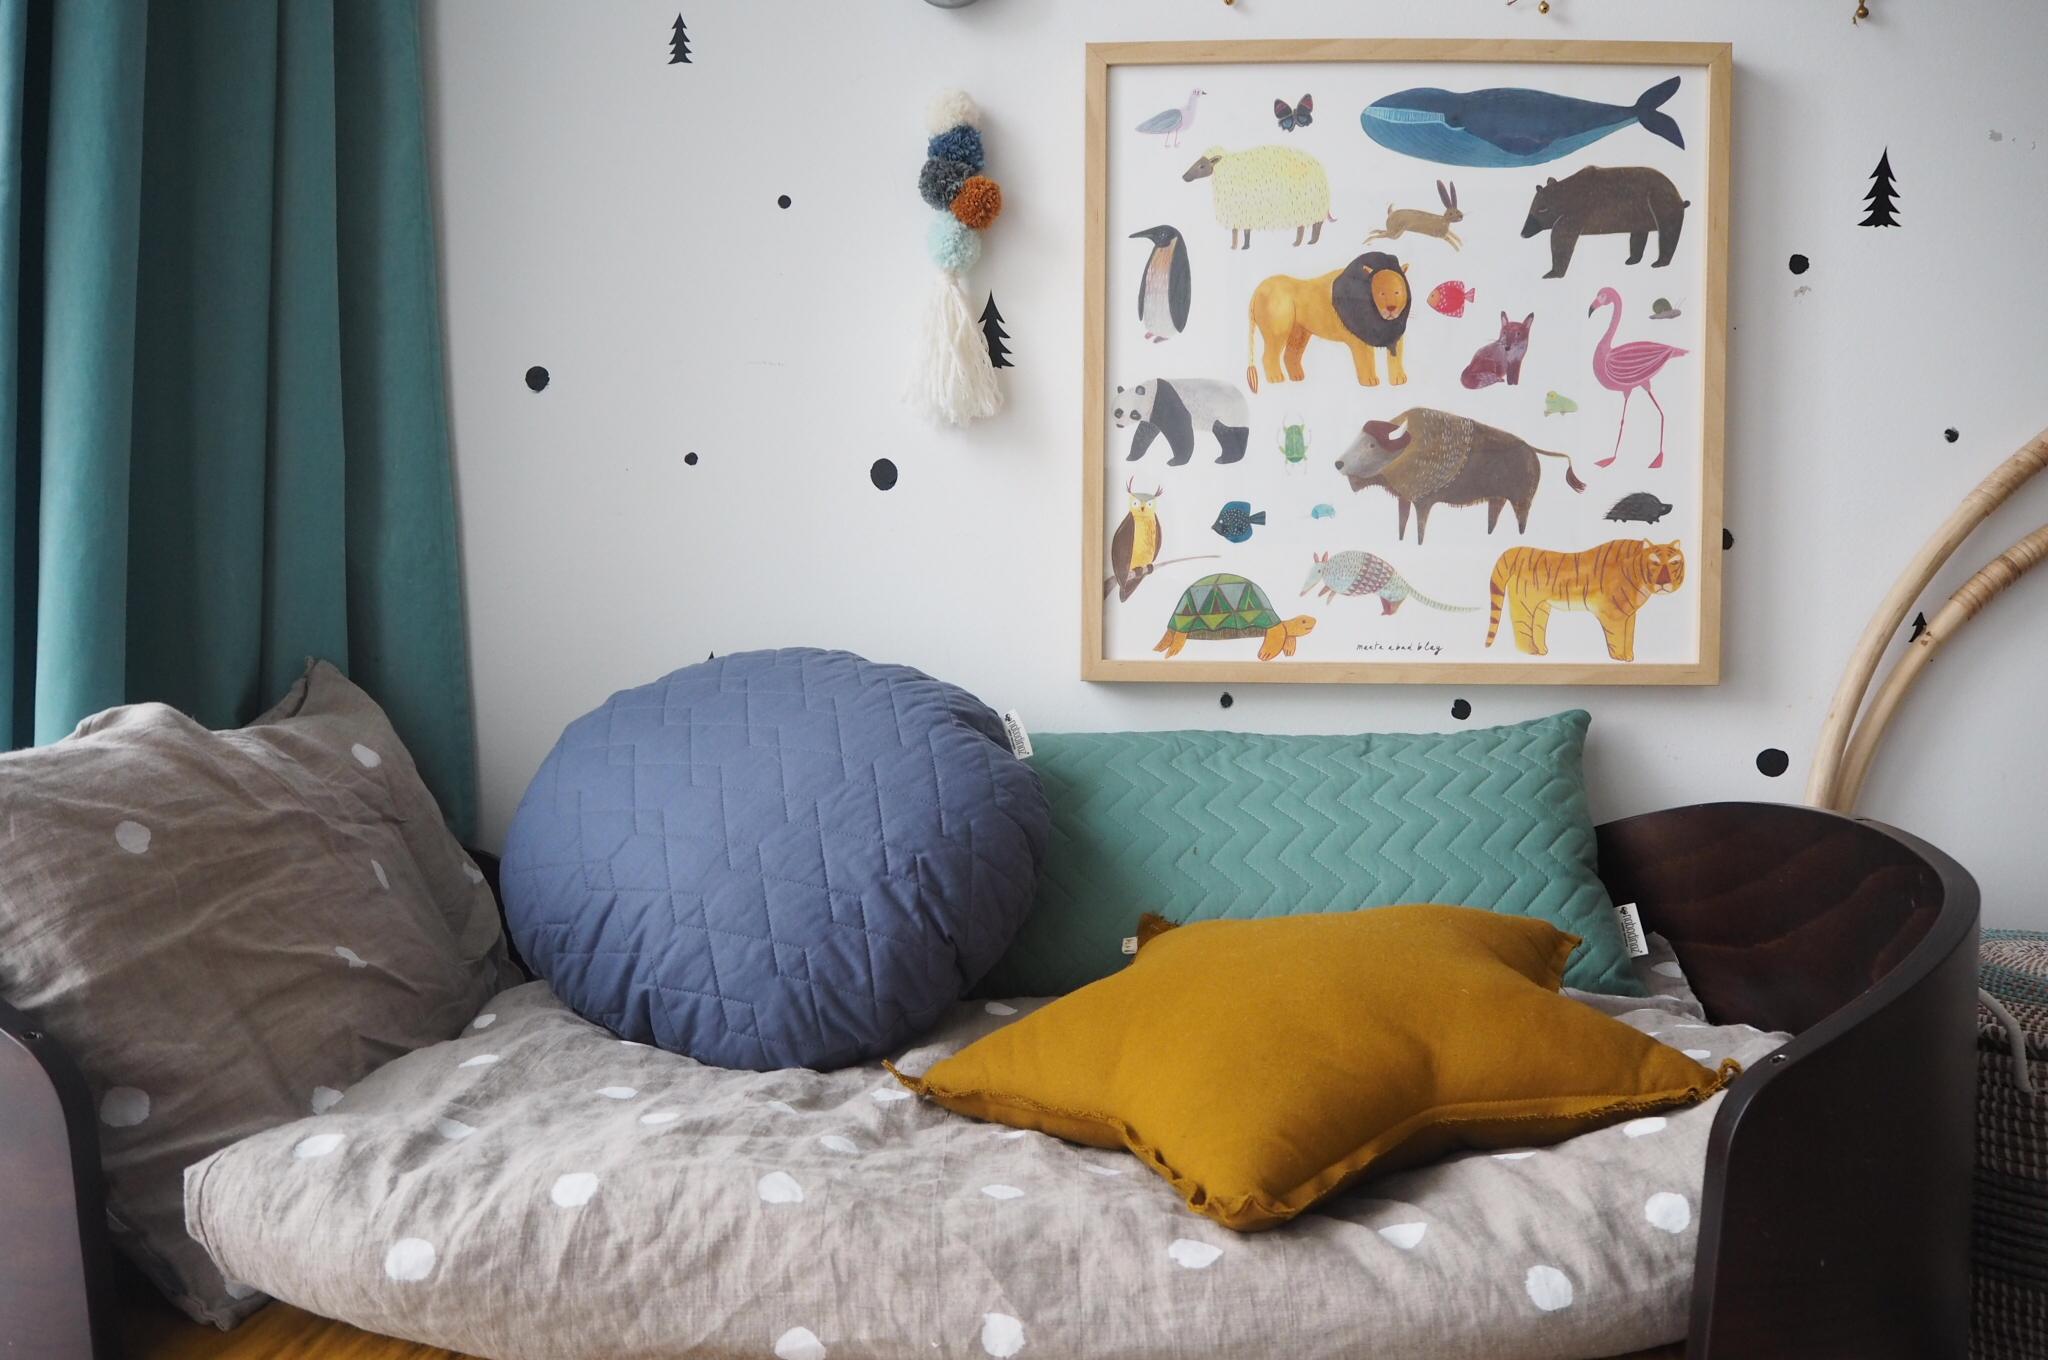 Mama blog i kinderzimmer dekoration accessoires shop aus for Accessoires kinderzimmer